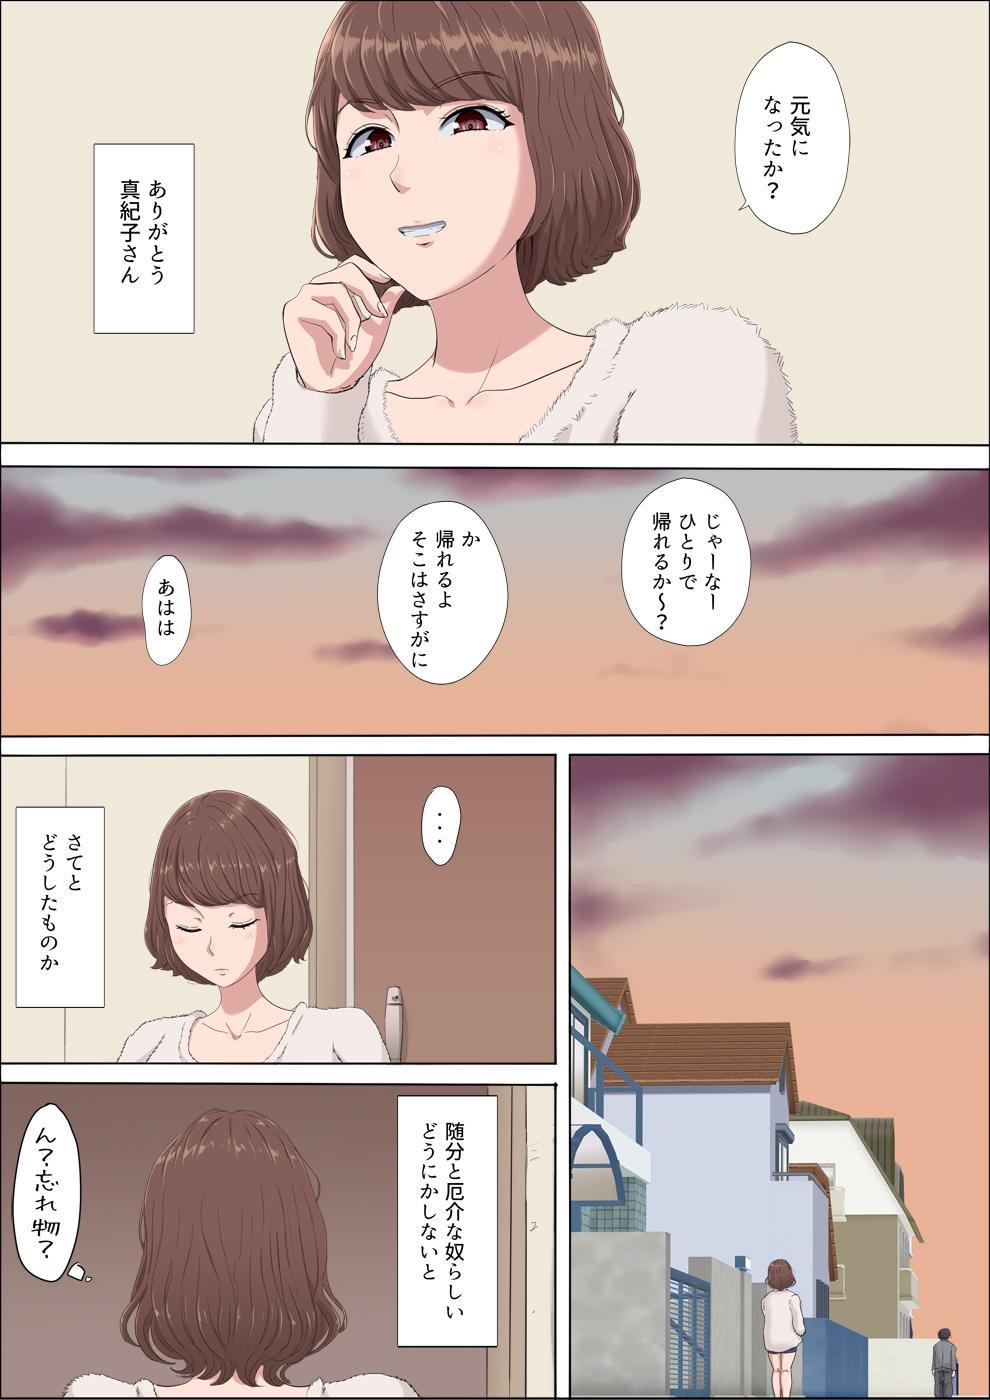 [Cotton house] Aya Nee ~Ubawareta Osananajimi~ 3 3